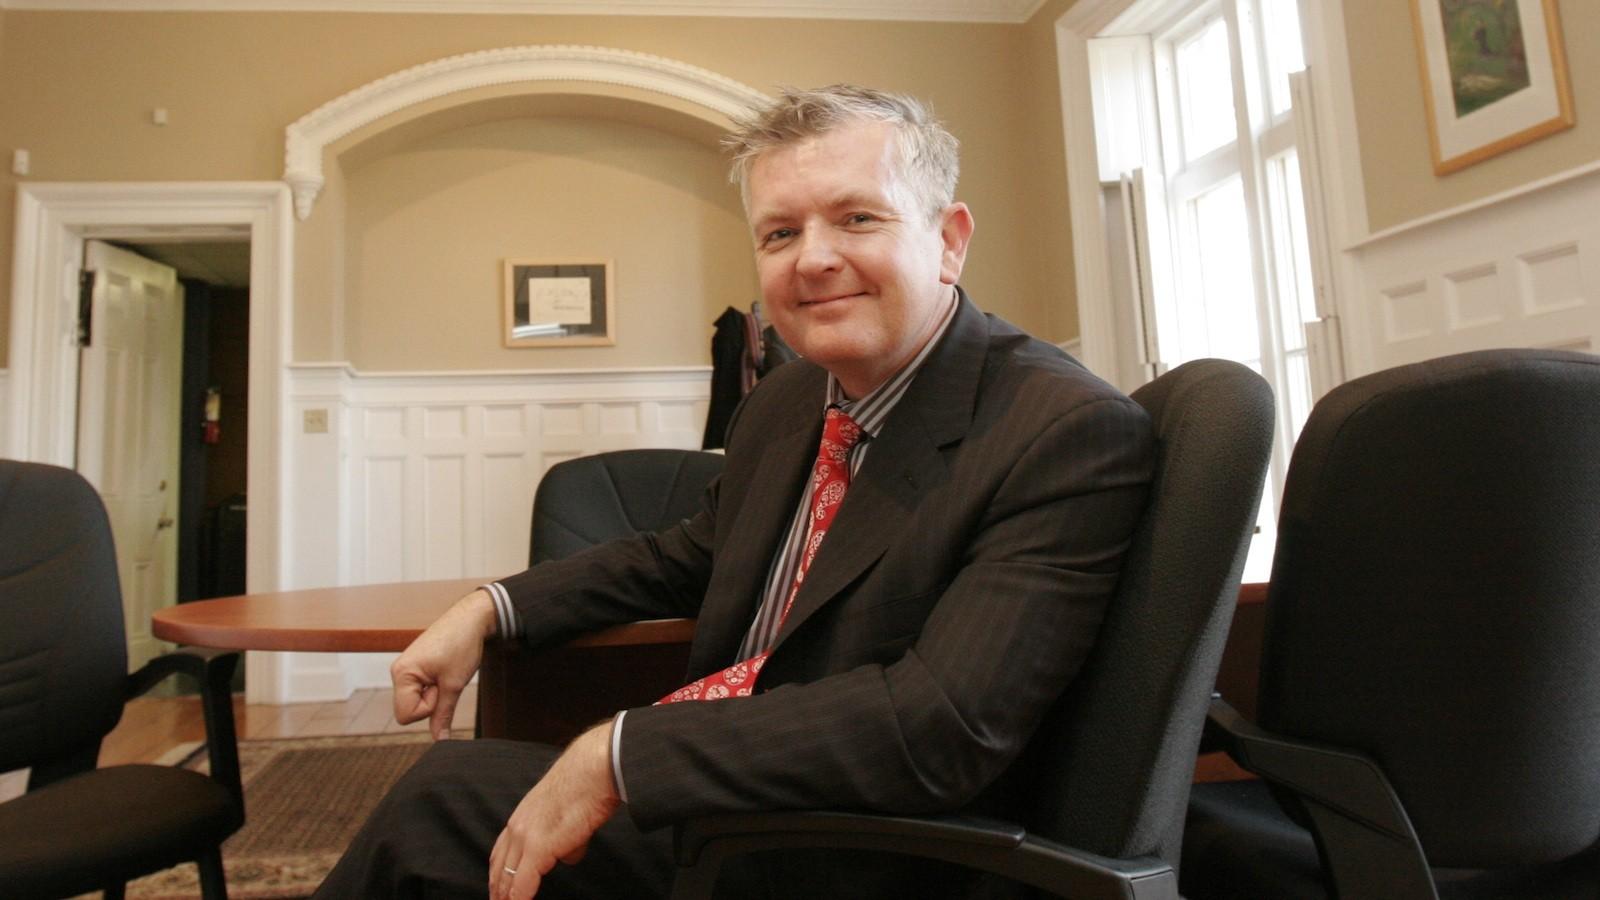 Stuart Reid, director/curator of Brock University's Rodman Hall Art Centre